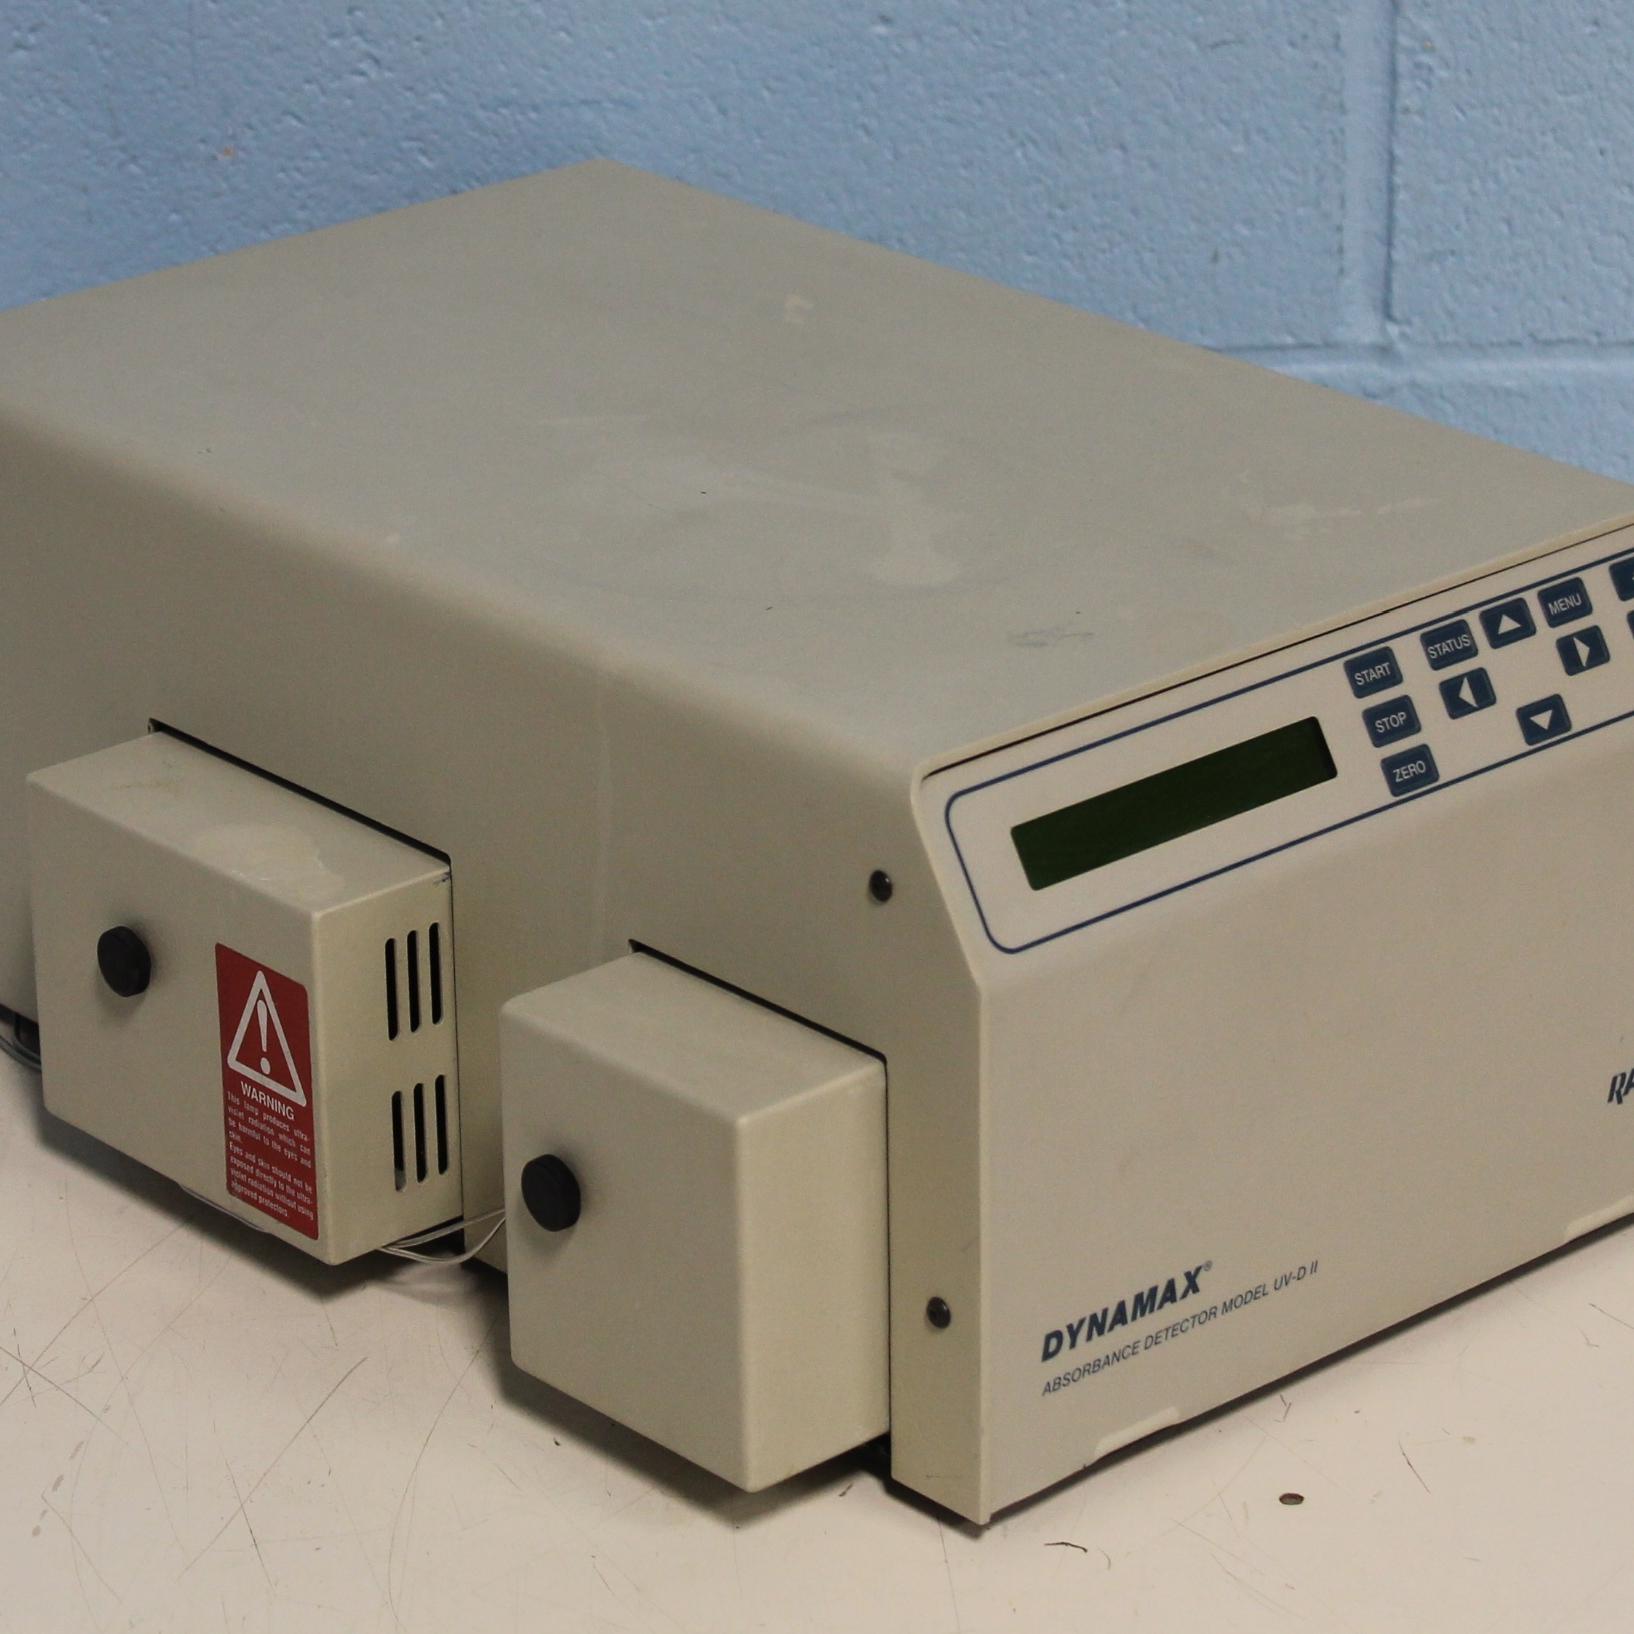 Rainin Dynamax Absorbance Detector Model UV-D II Image